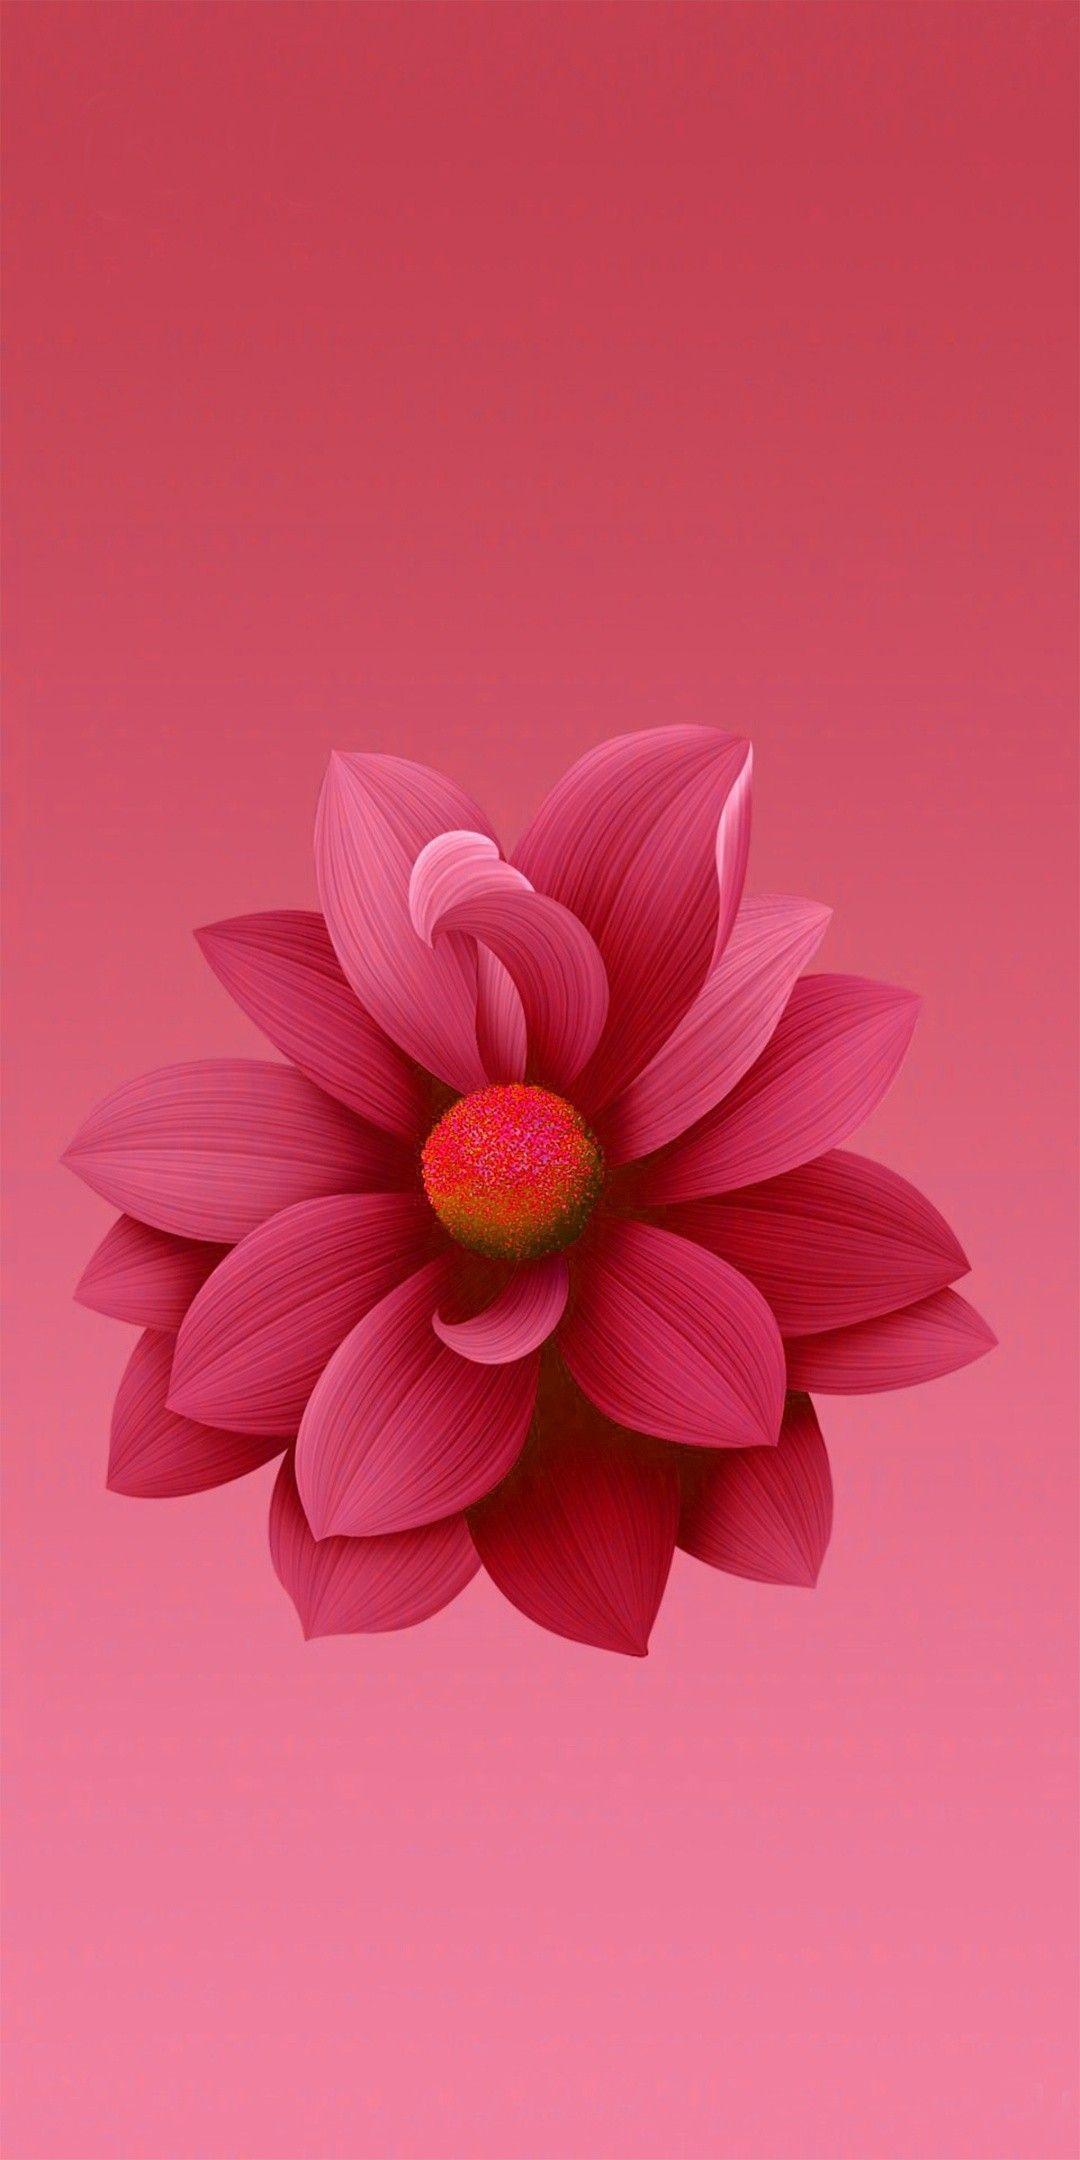 Official iOS 9 Wallpaper (5 of 15) iOS Pinterest iOS